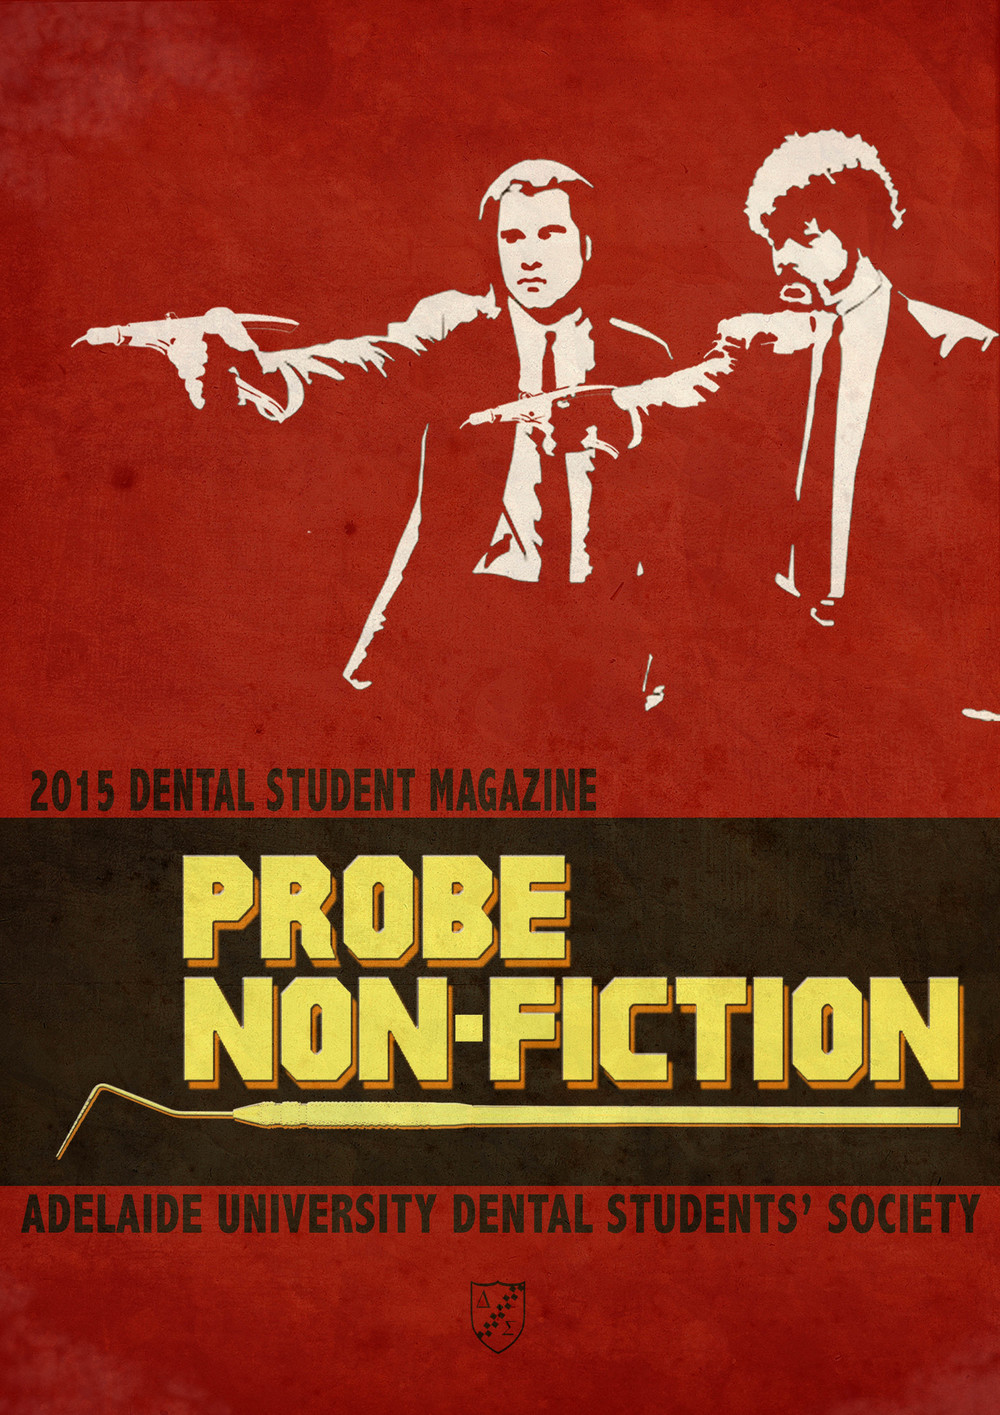 Probe Non-fiction